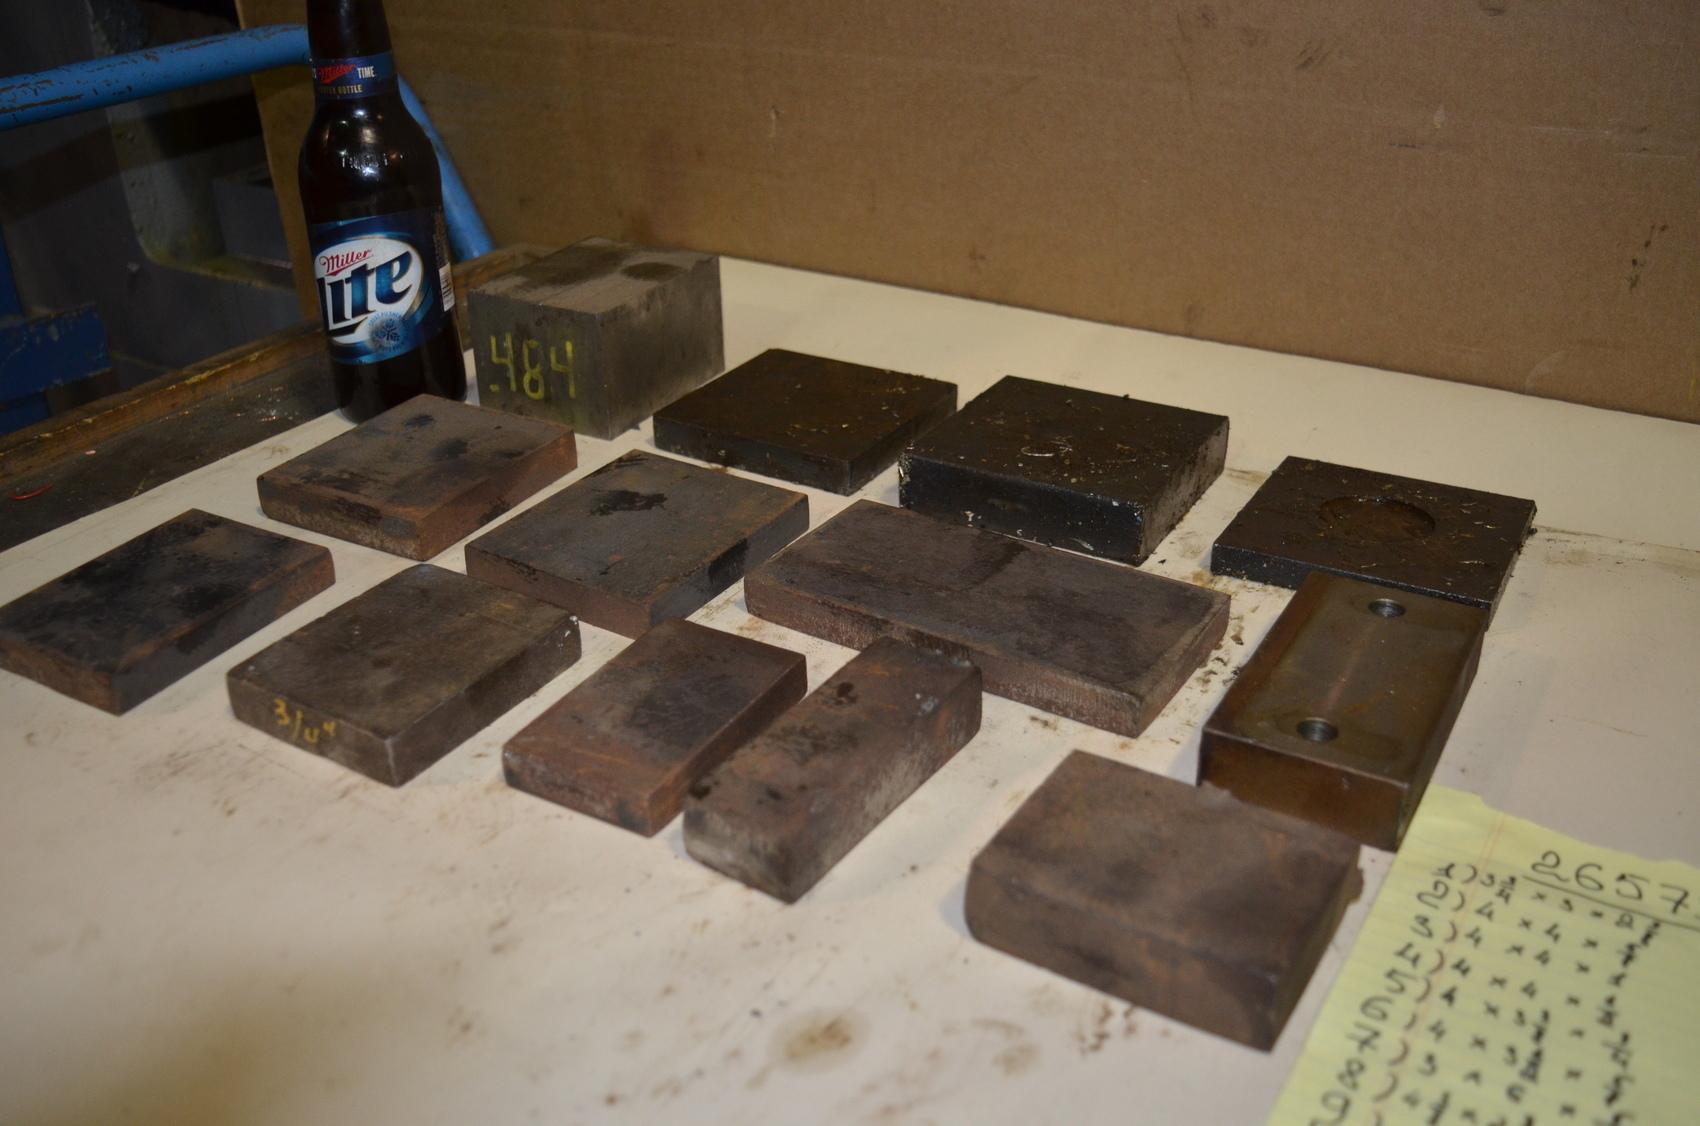 Lot of 13 steel Rectangular Bar for blacksmith anvil,38 lbs